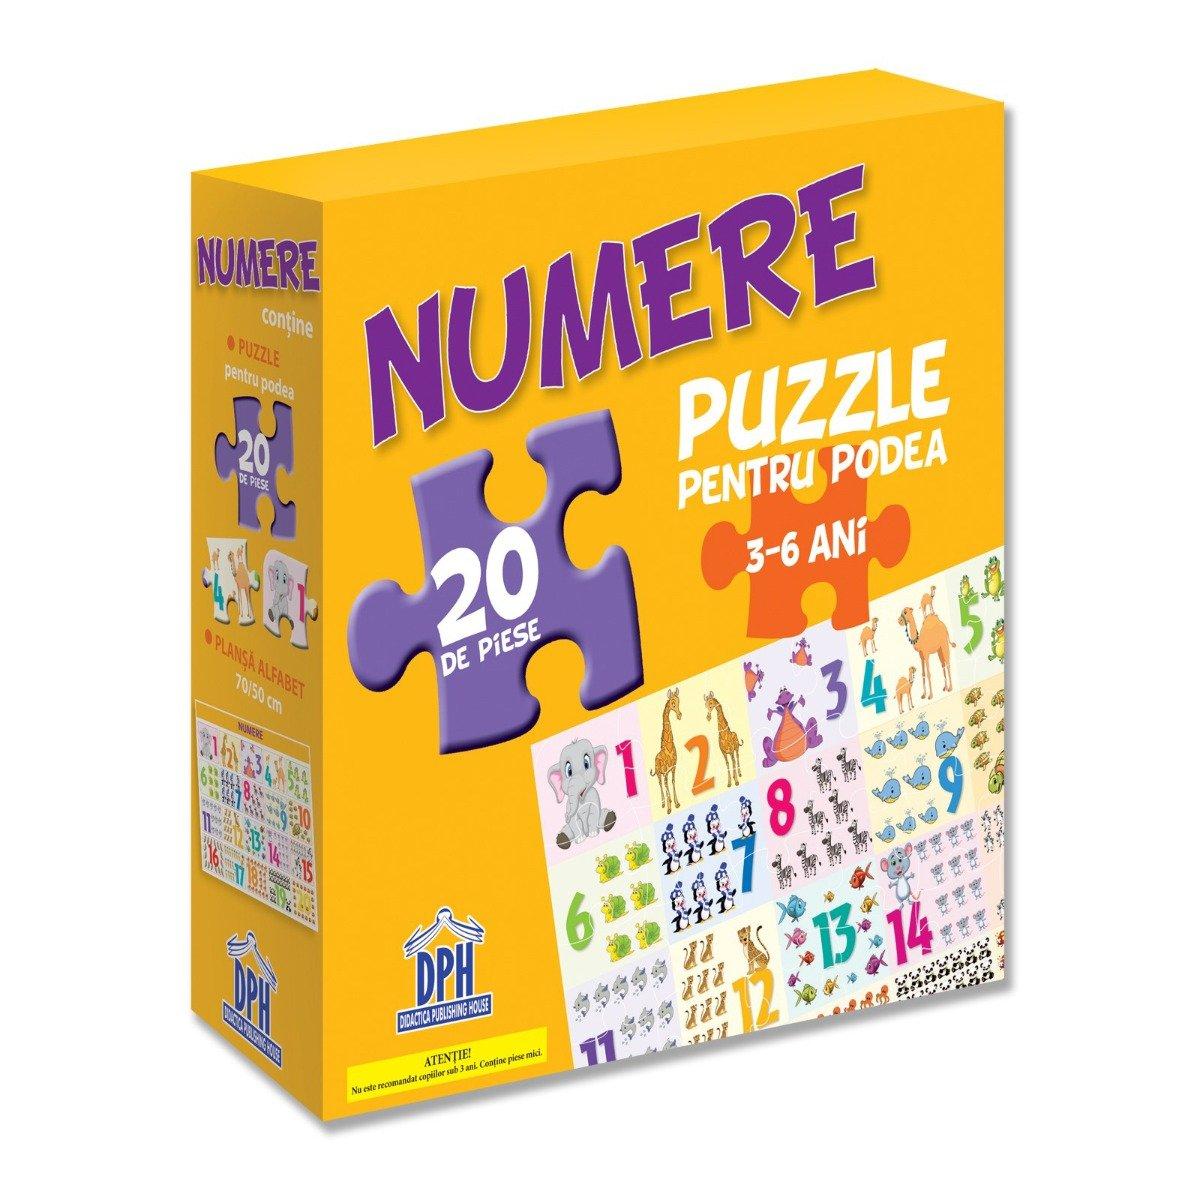 Puzzle pentru podea Editura DPH, Numere, 20 piese